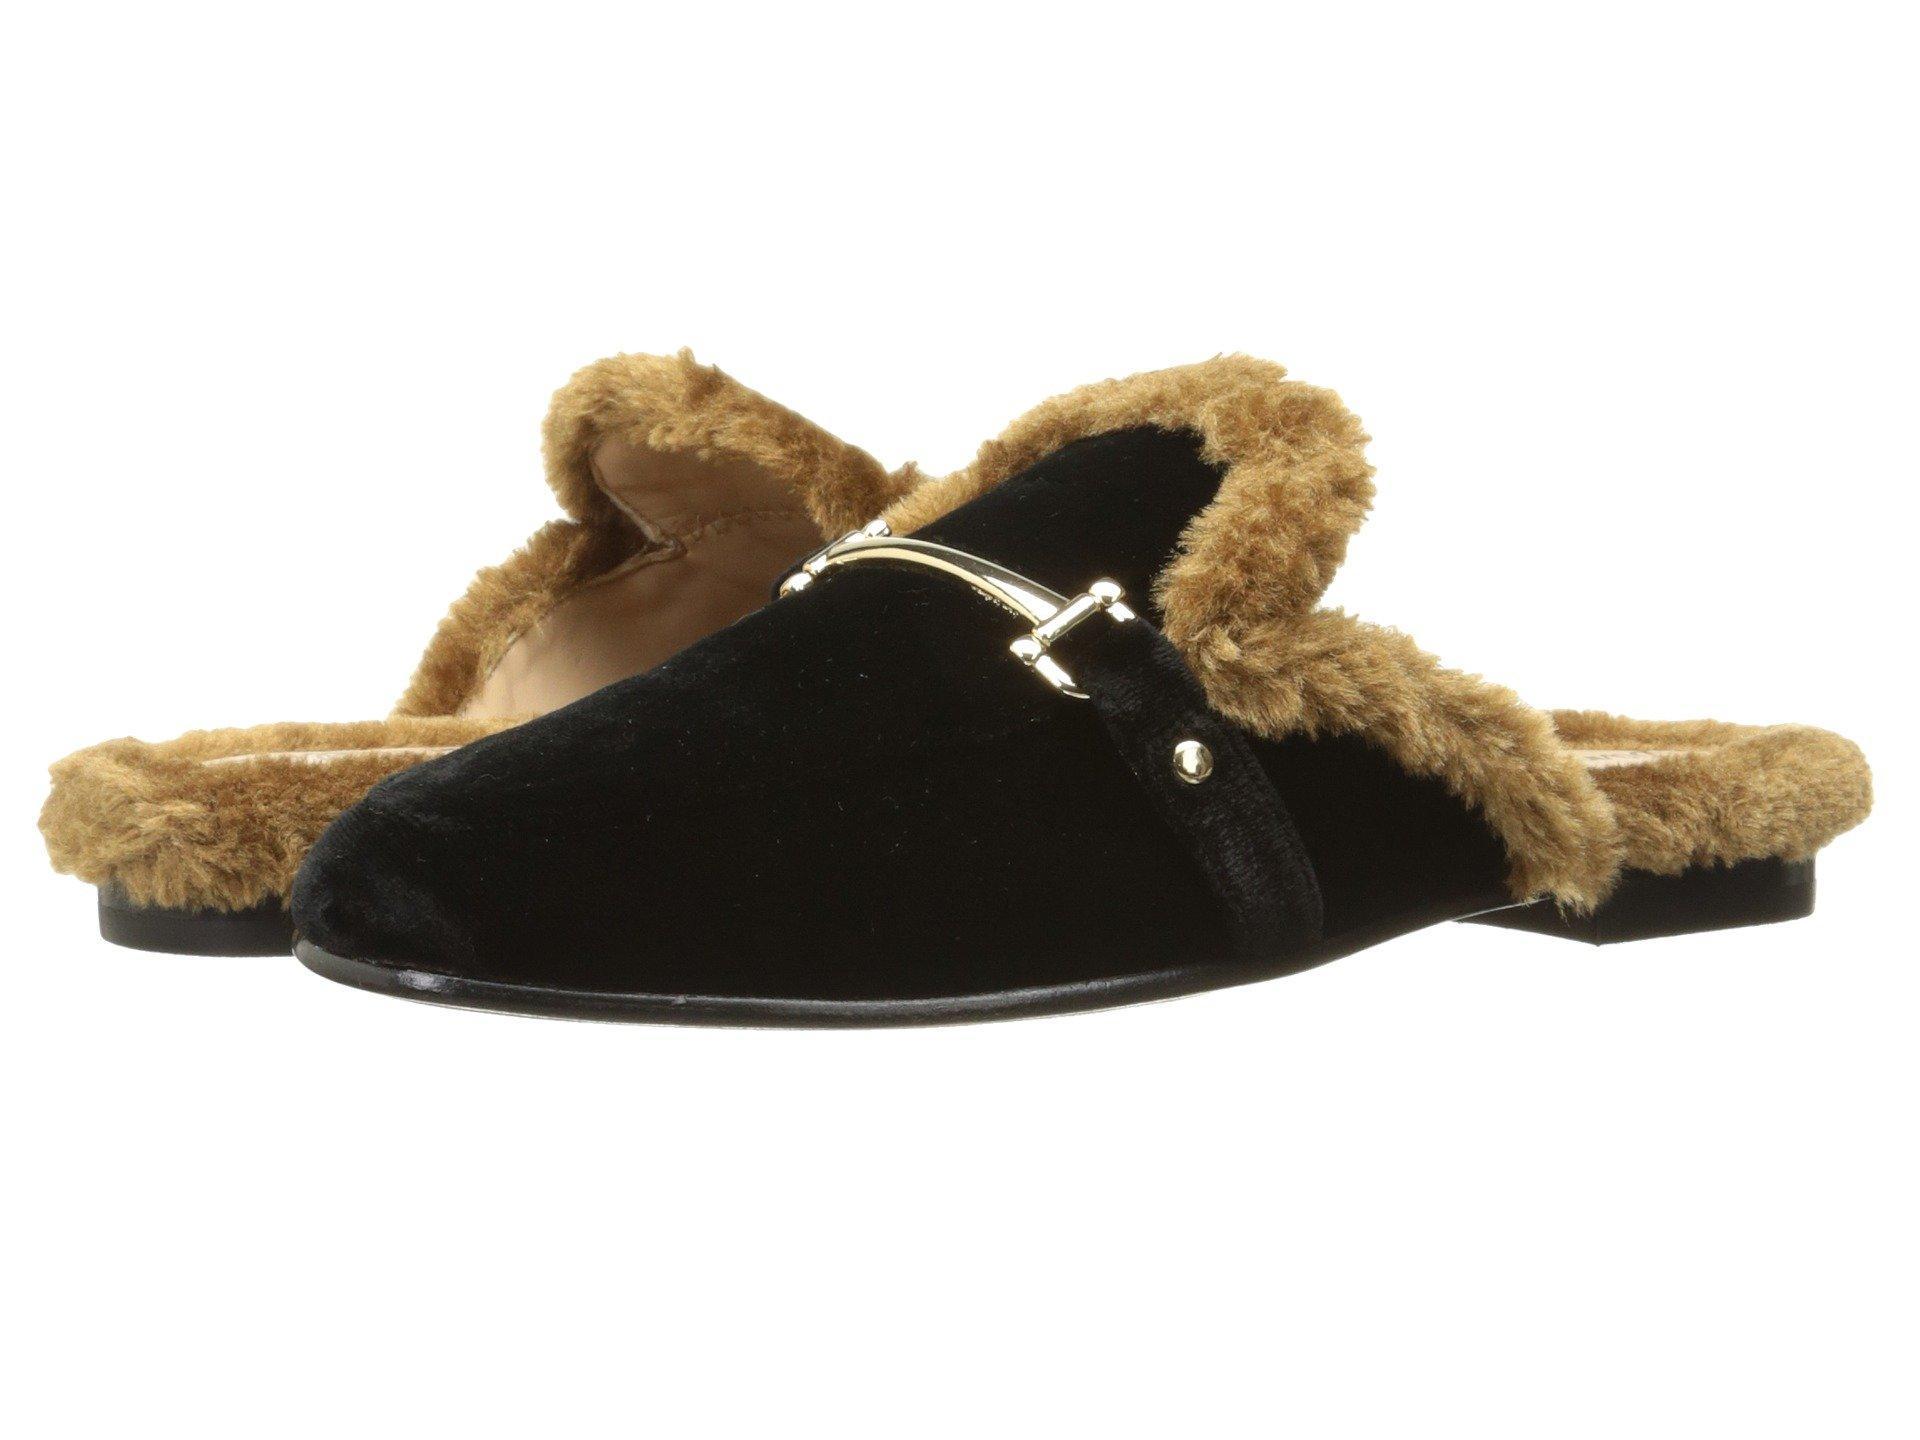 cb00b3a6e1f5 Sam Edelman Danica Faux Fur Slippers In Black